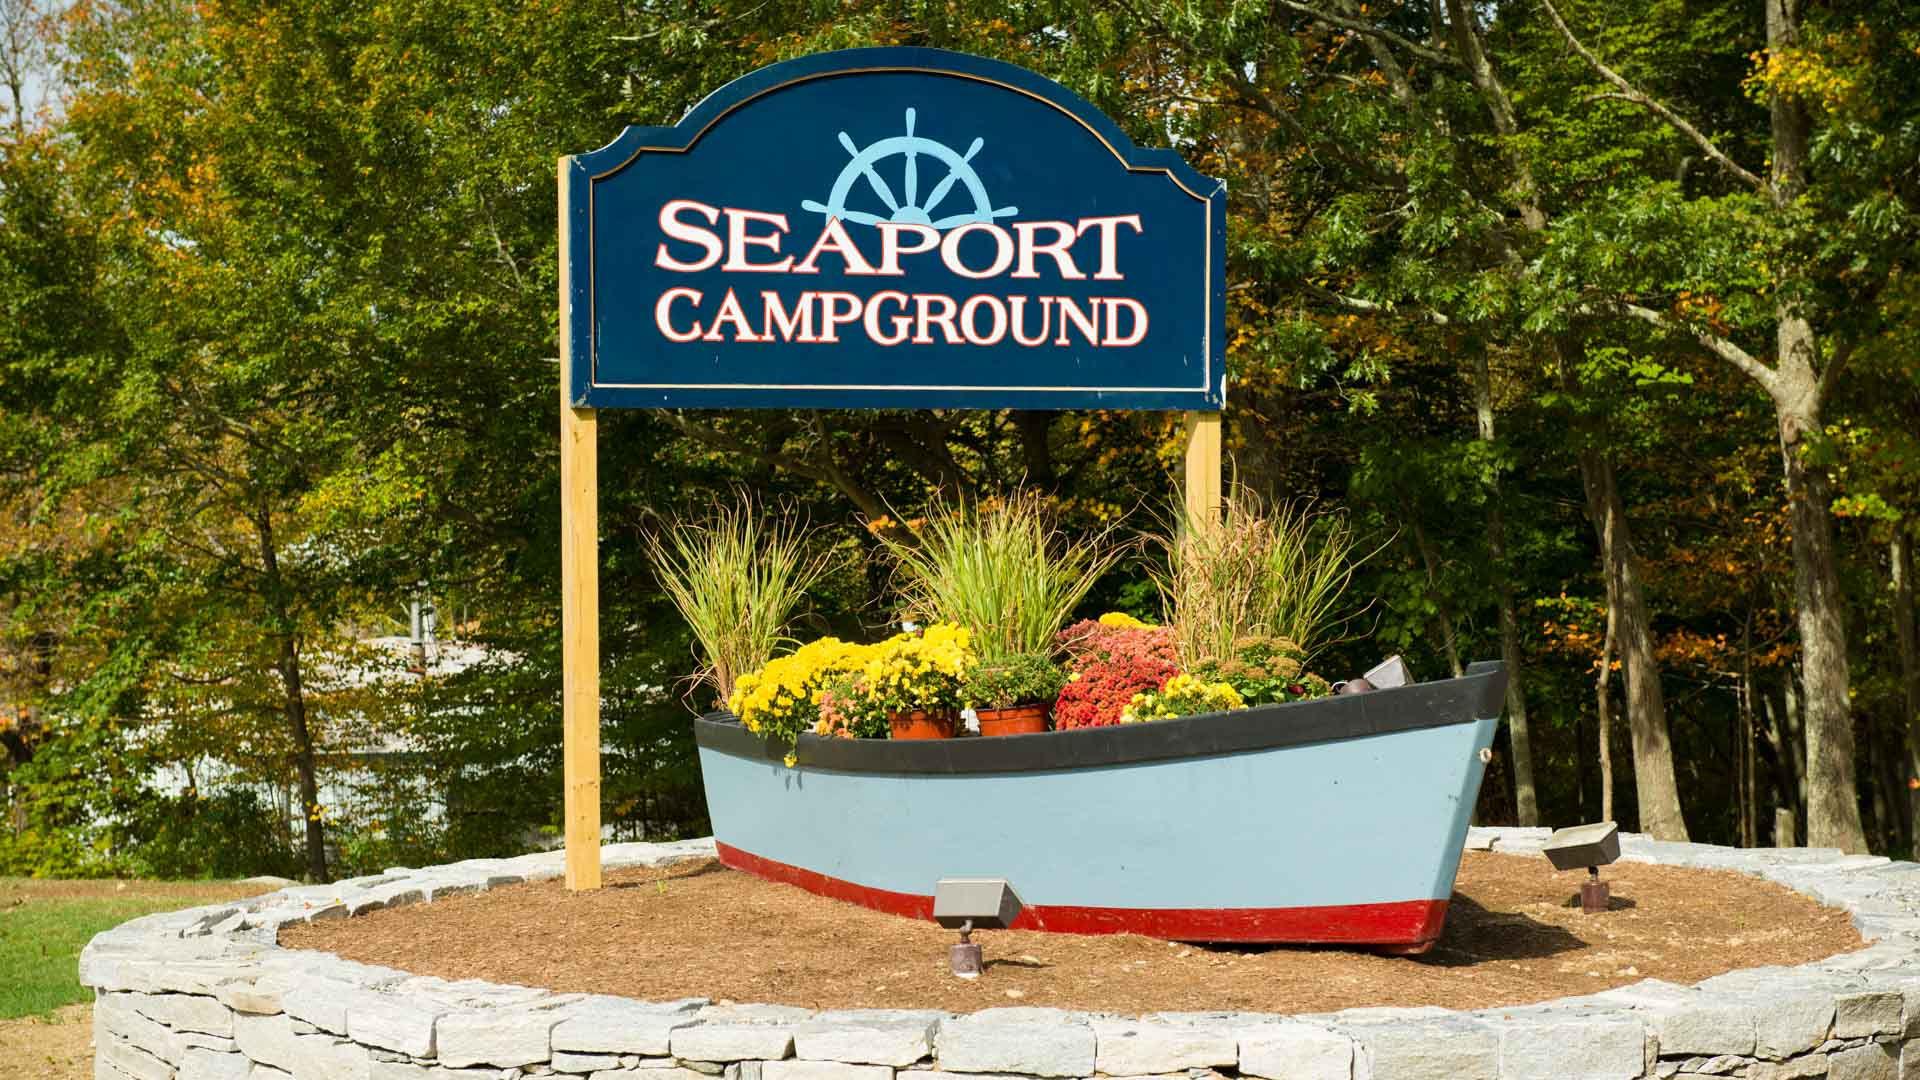 Seaport RV Resort & Campground Old Mystic CT 06372